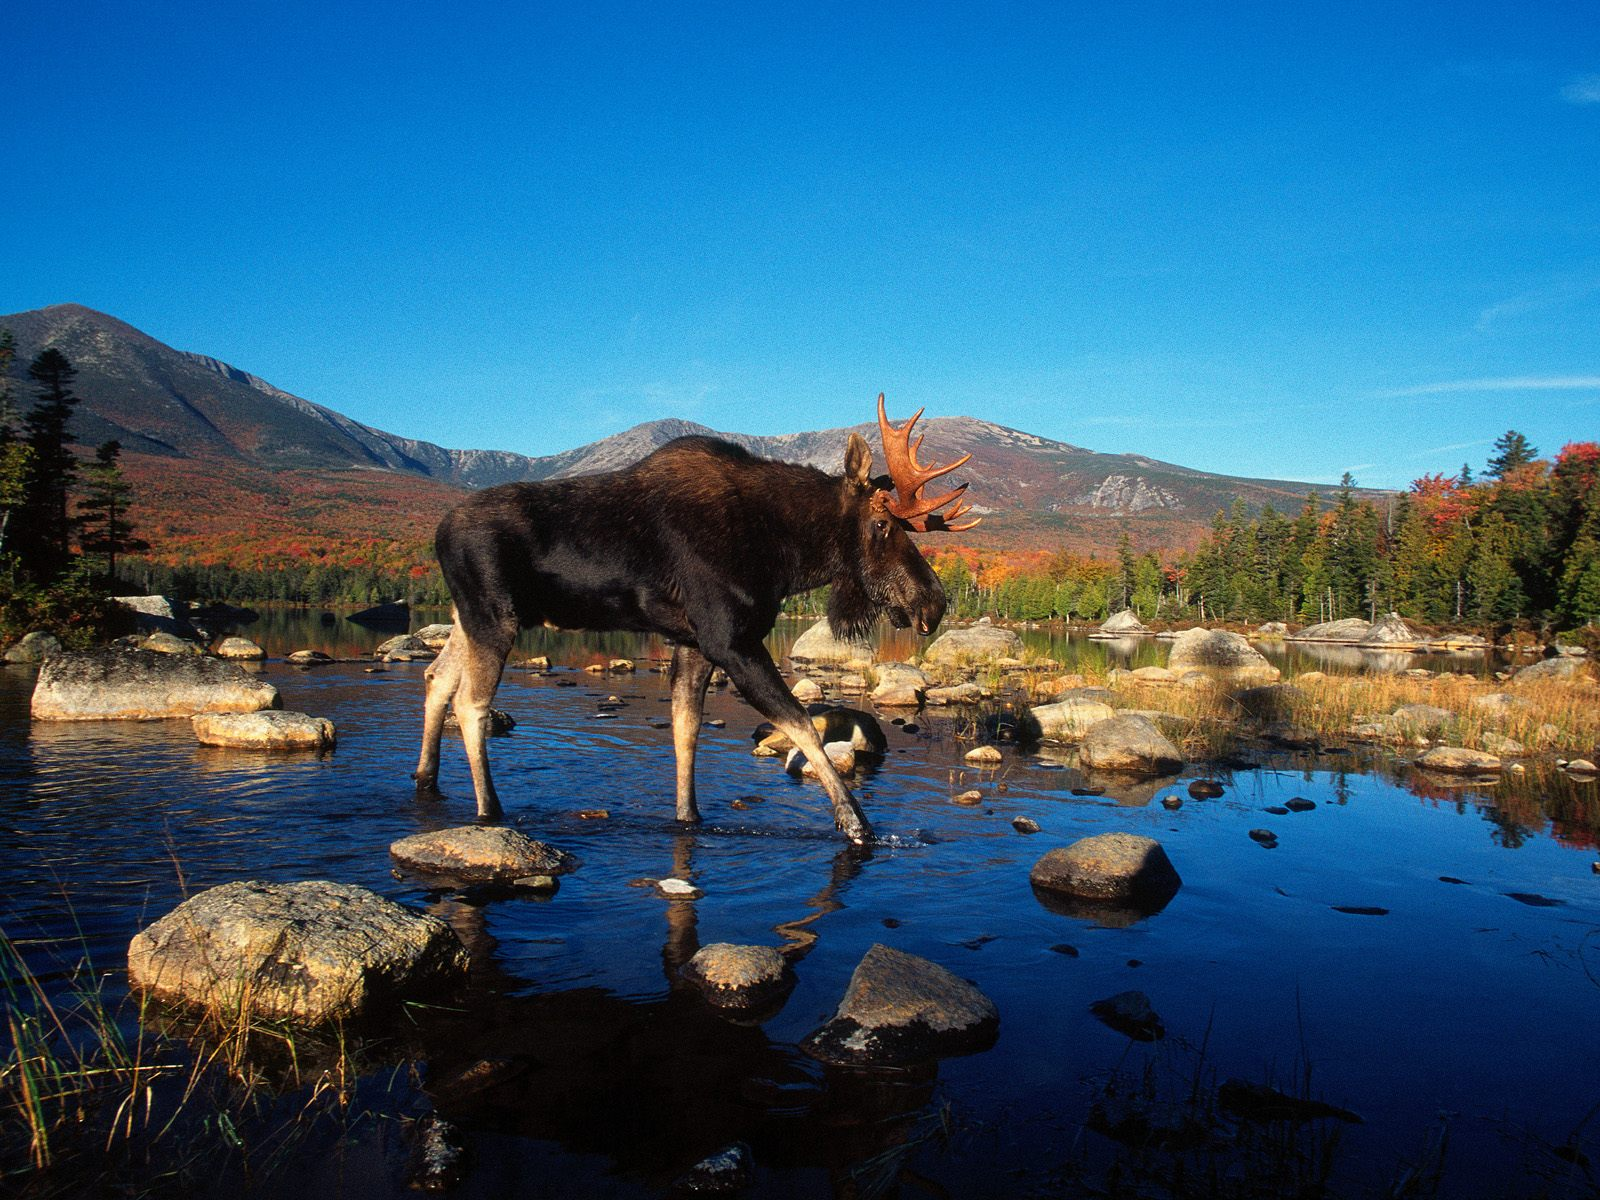 moose wallpaper landscape